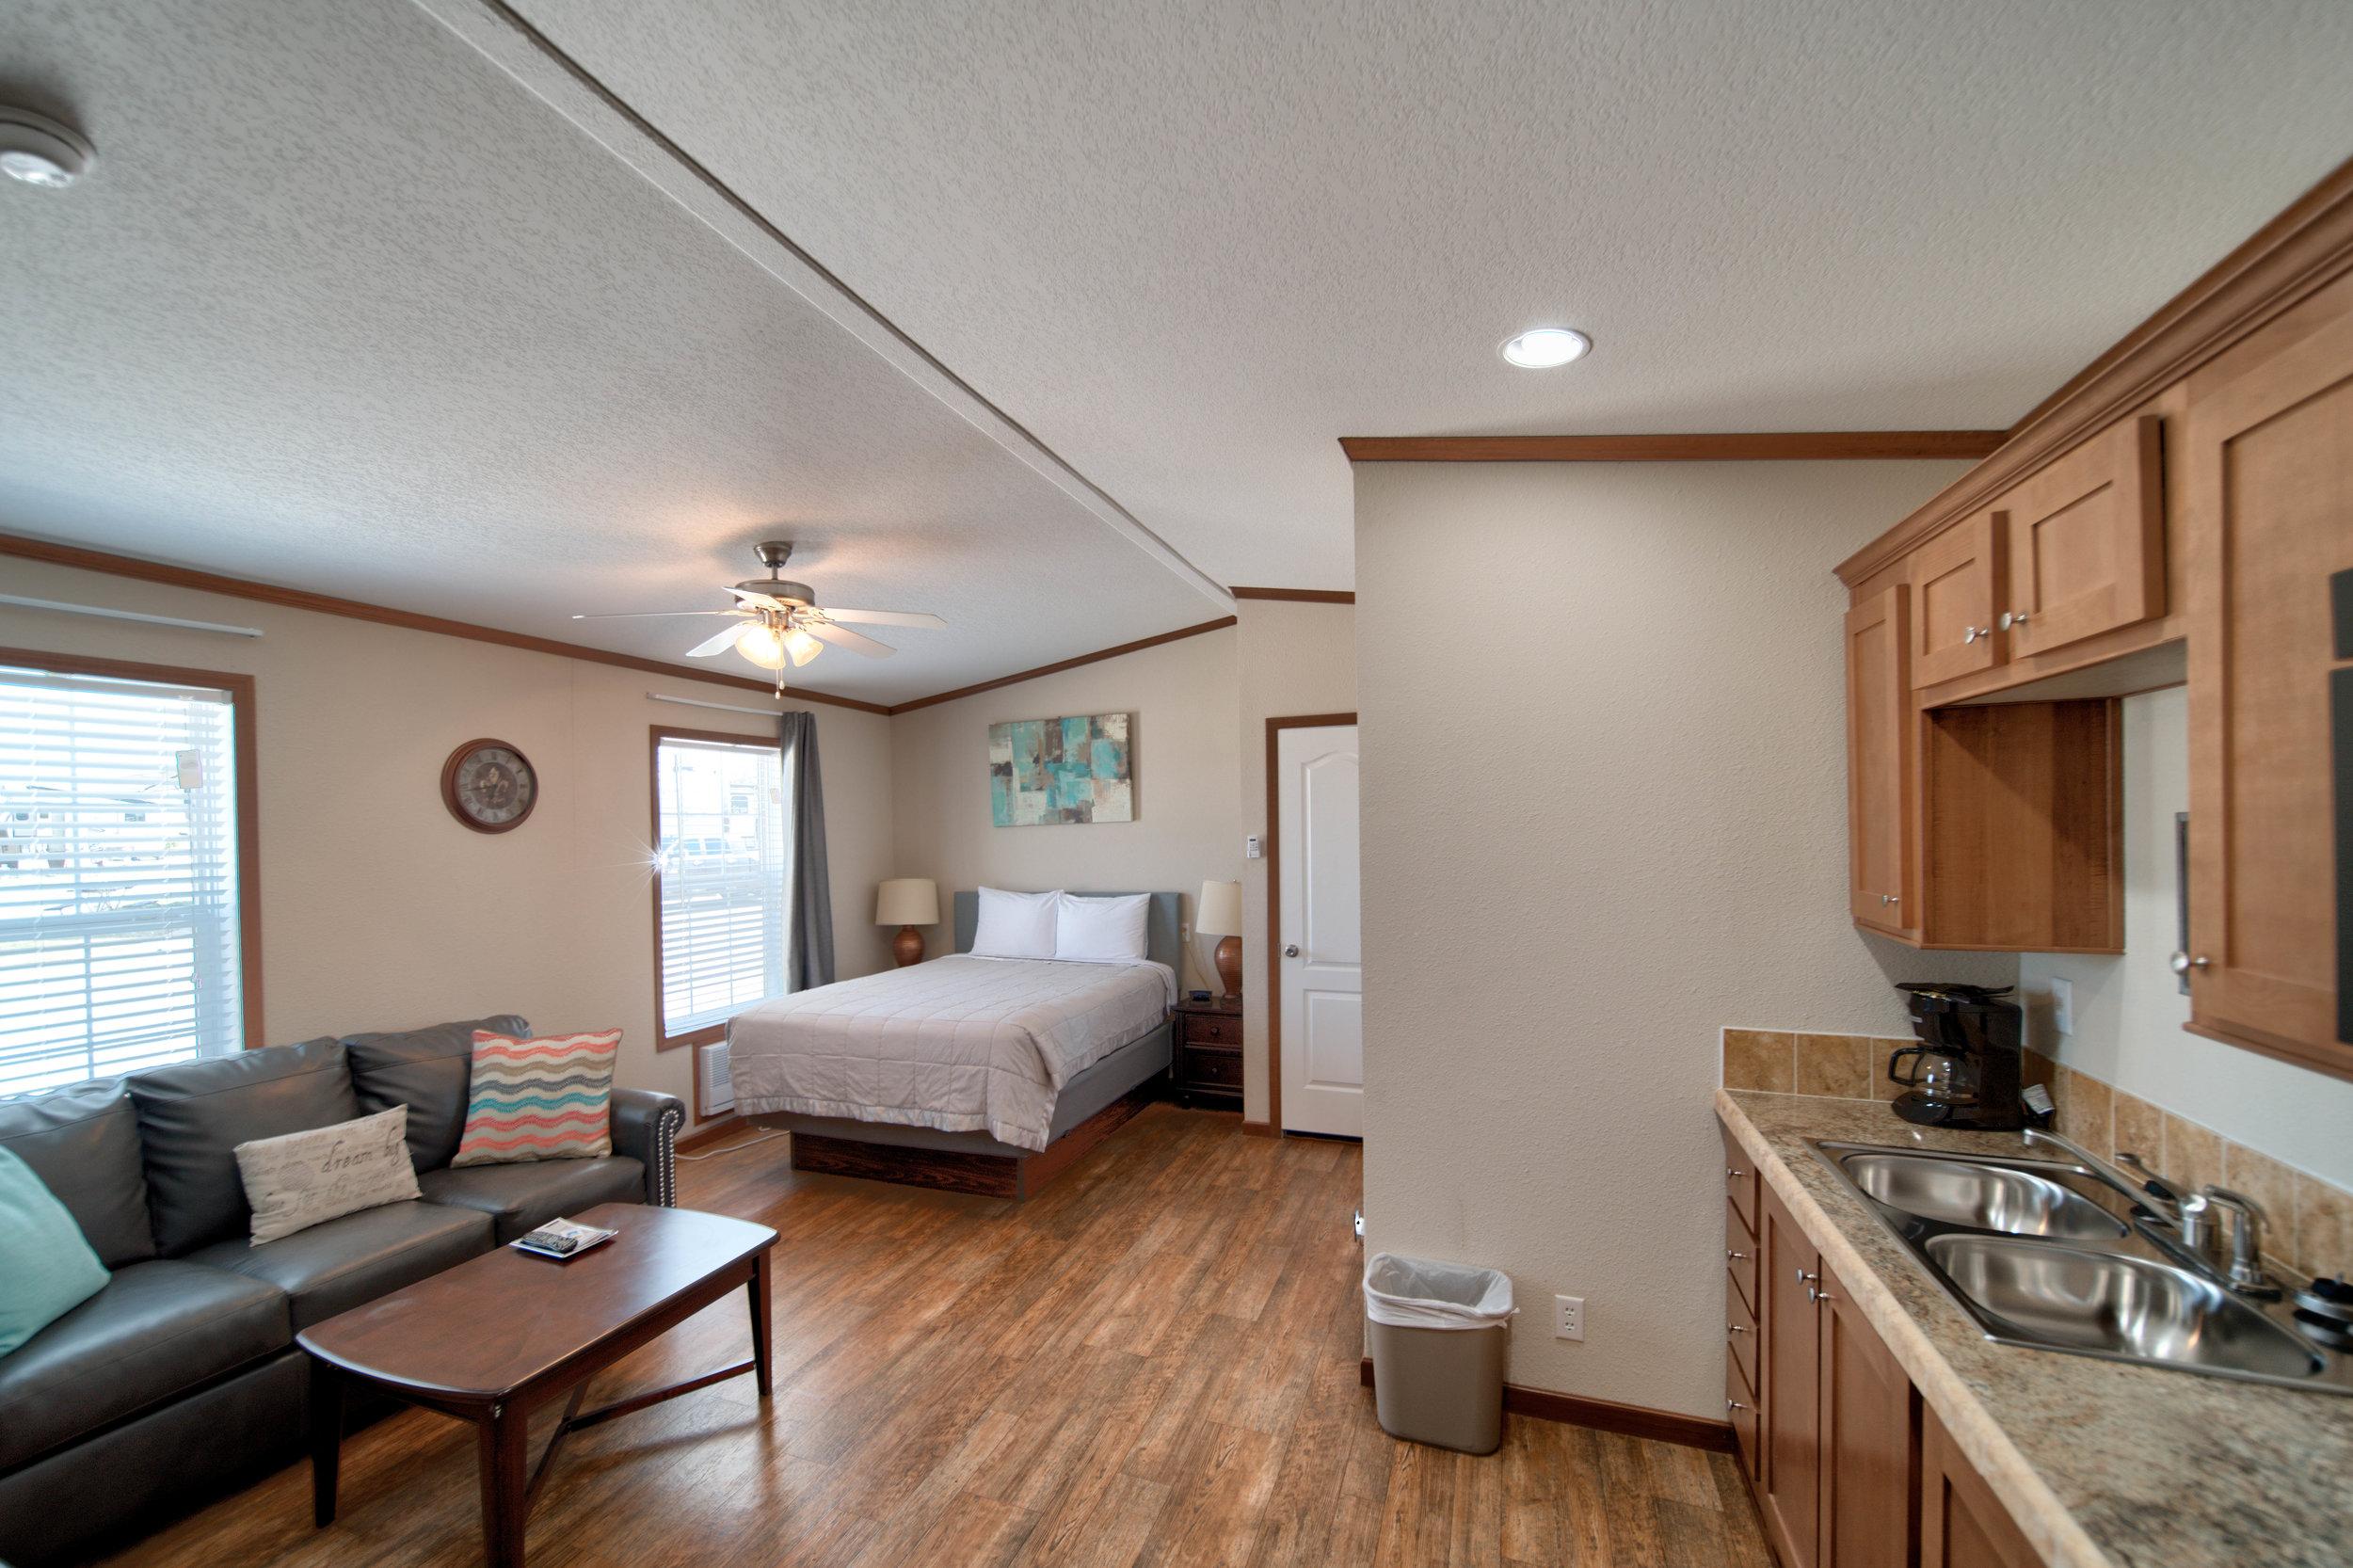 grand lake Oklahoma cabin rental.jpg